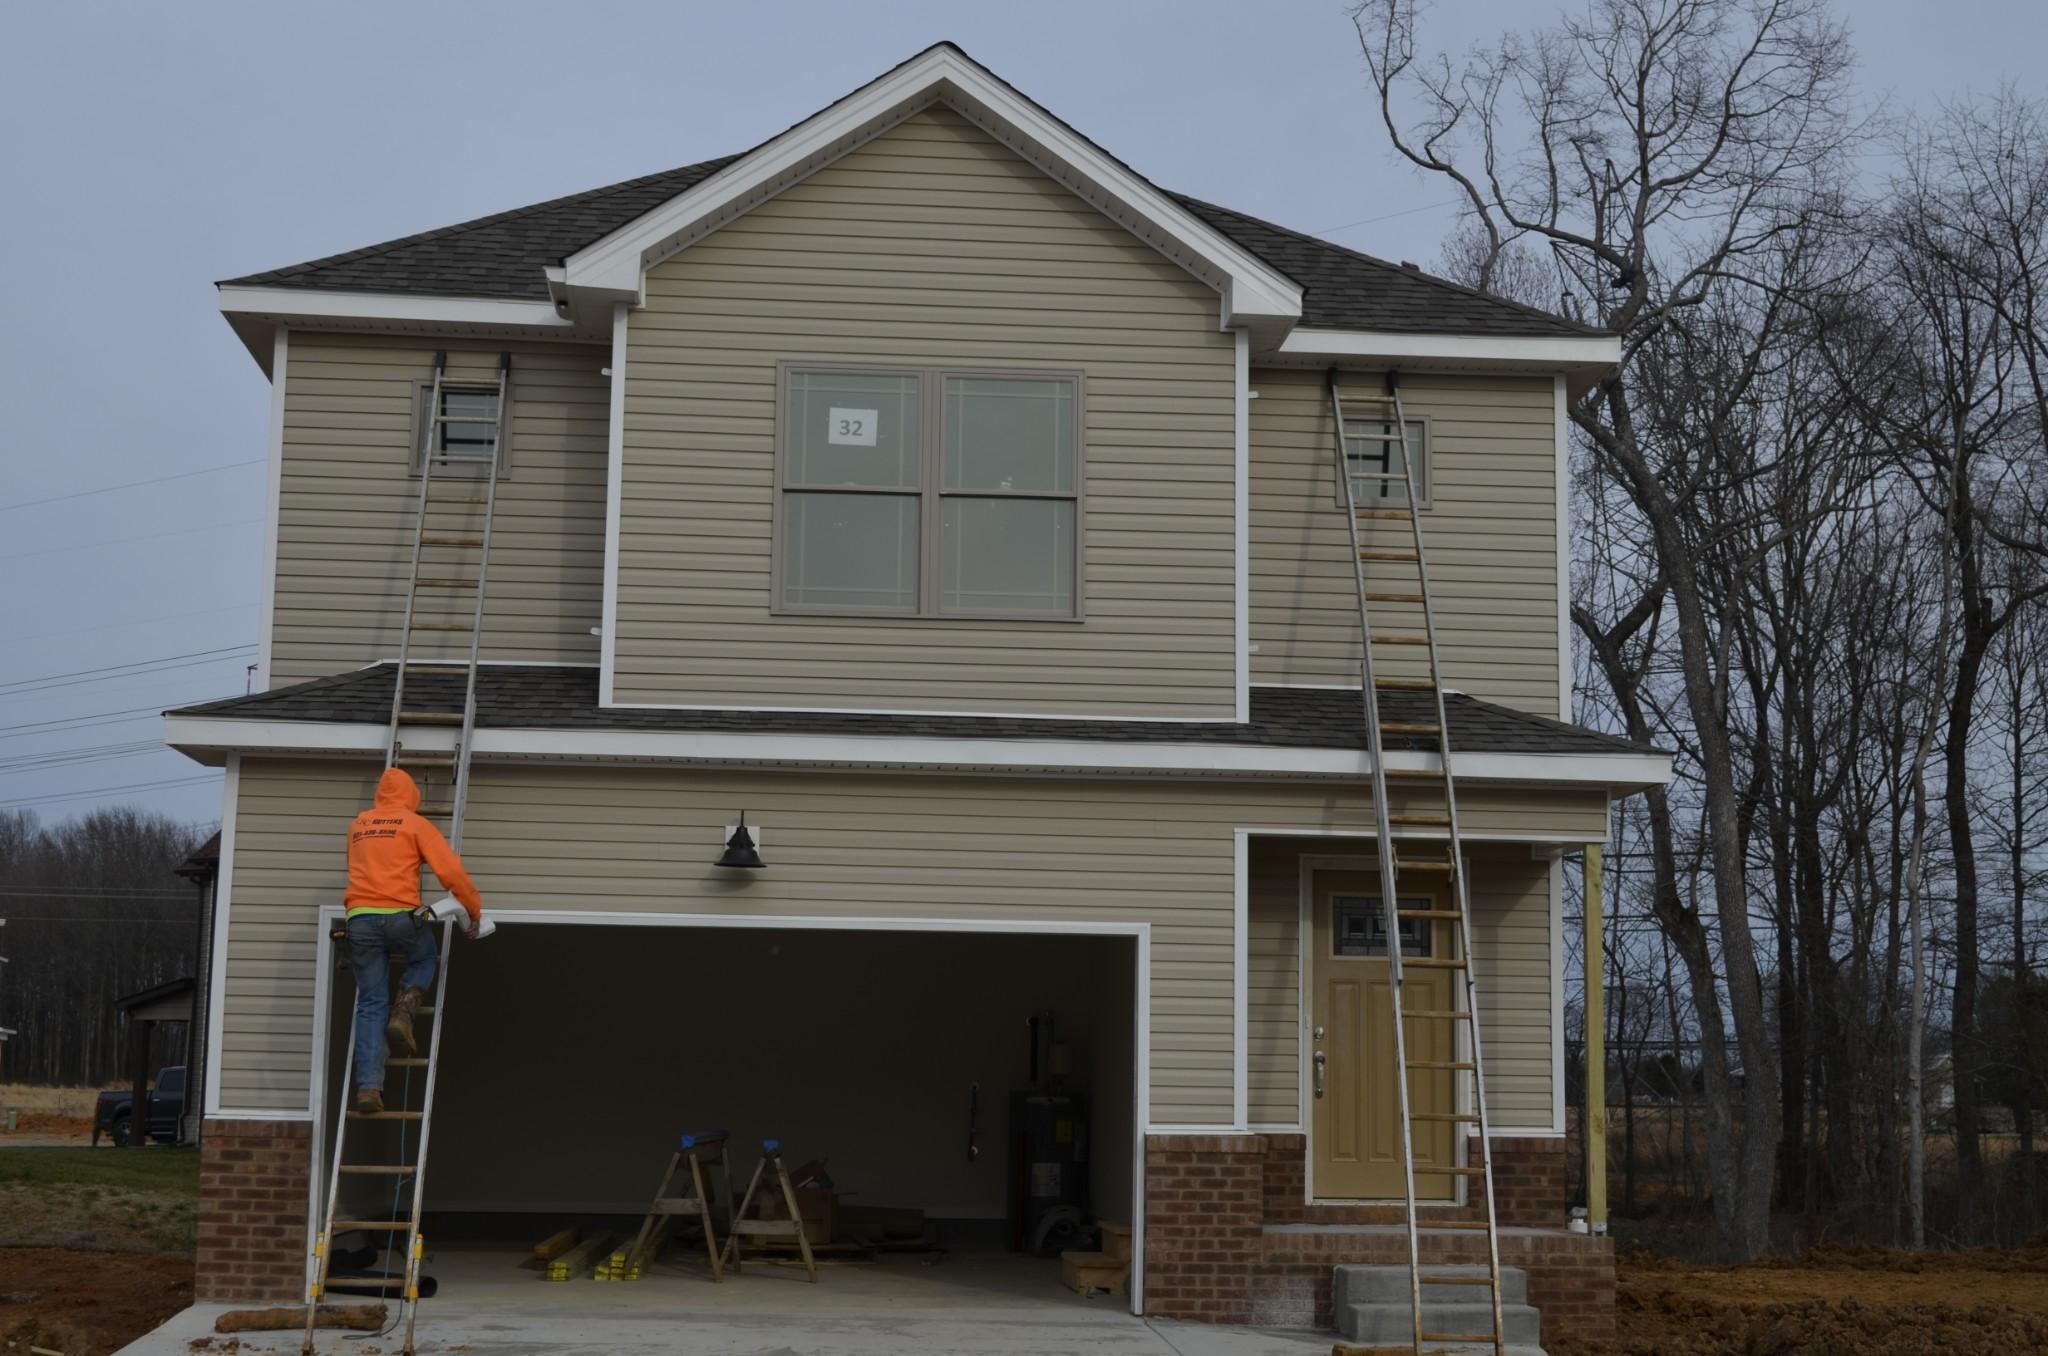 1213 Ewing Way, Clarksville, TN 37043 - Clarksville, TN real estate listing